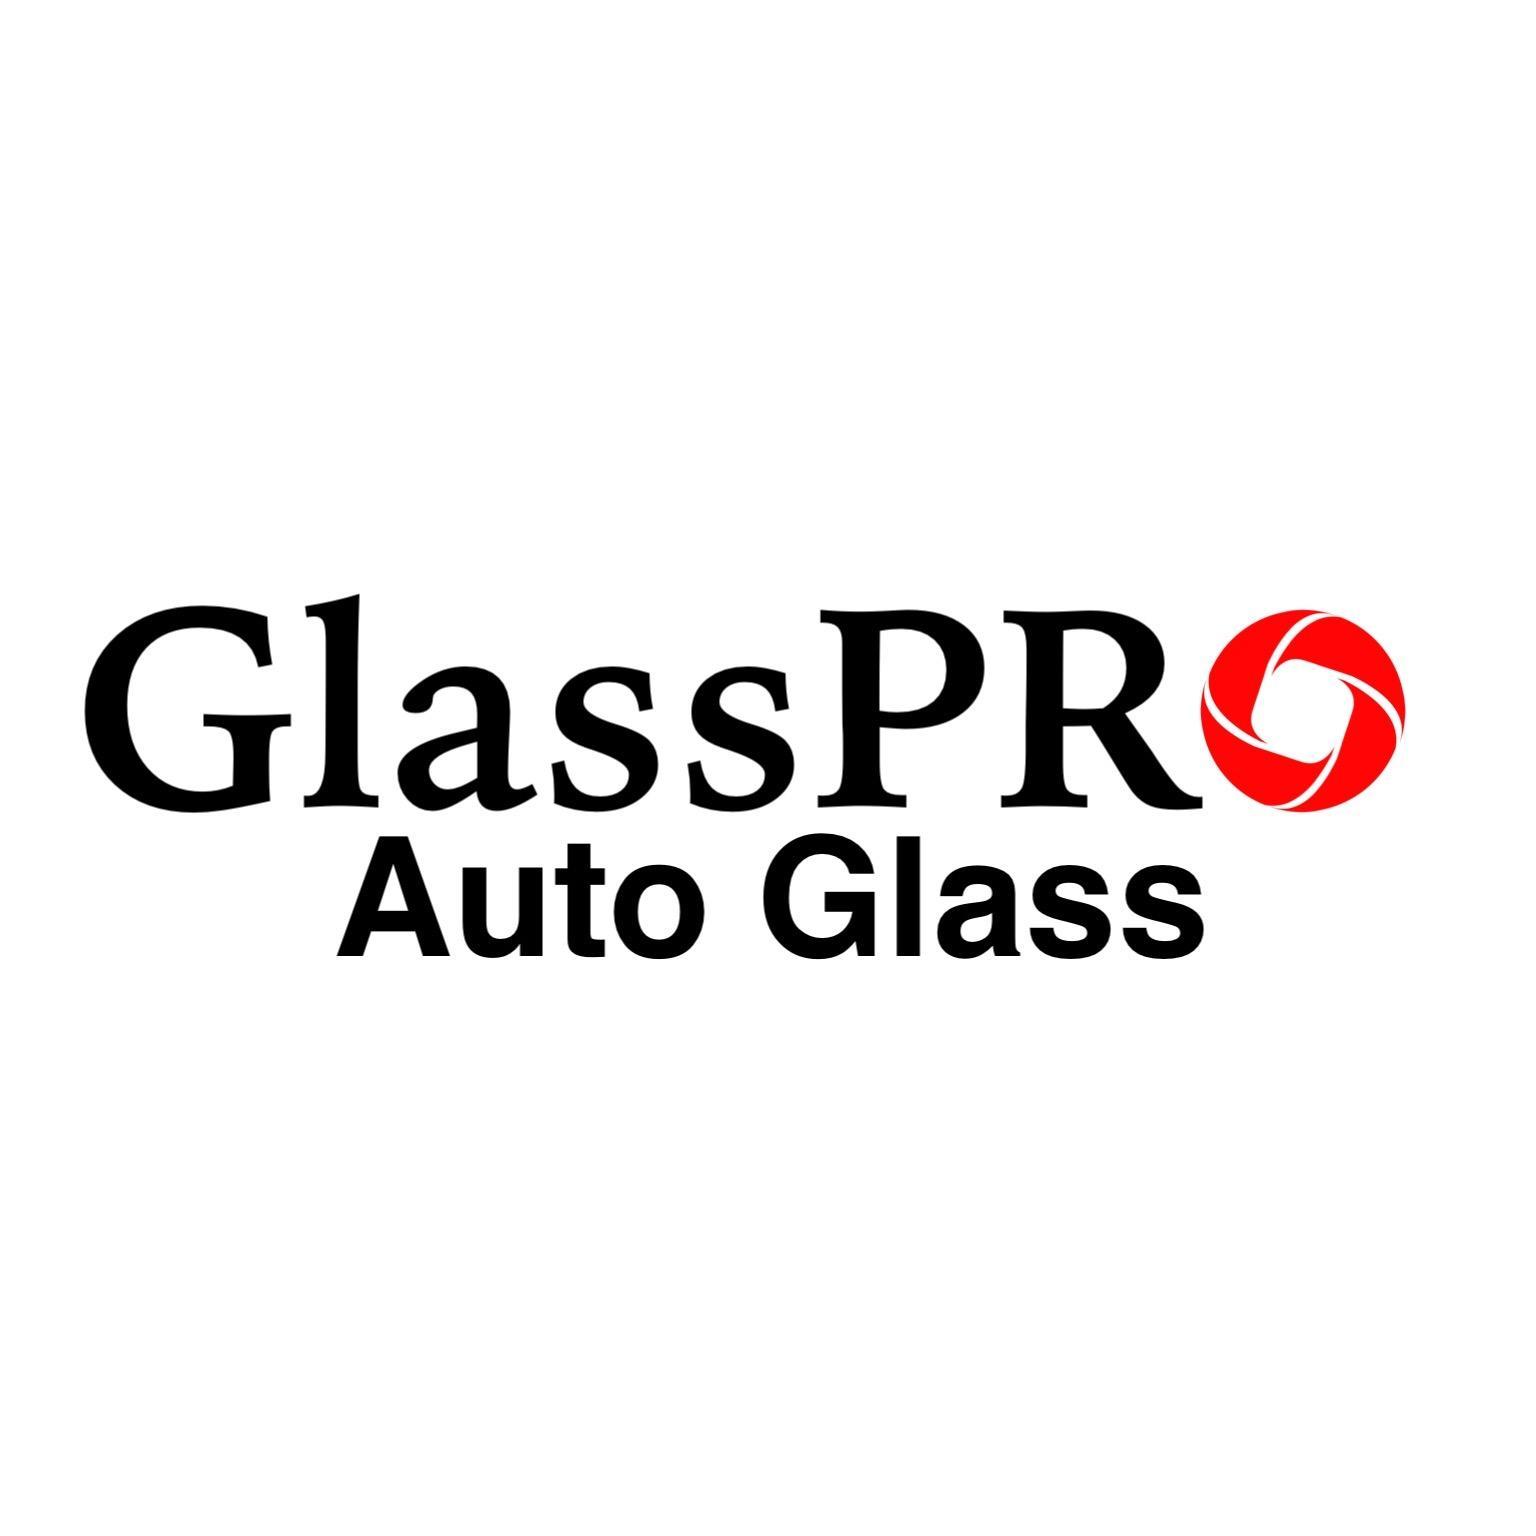 GlassPRO Auto Glass image 17